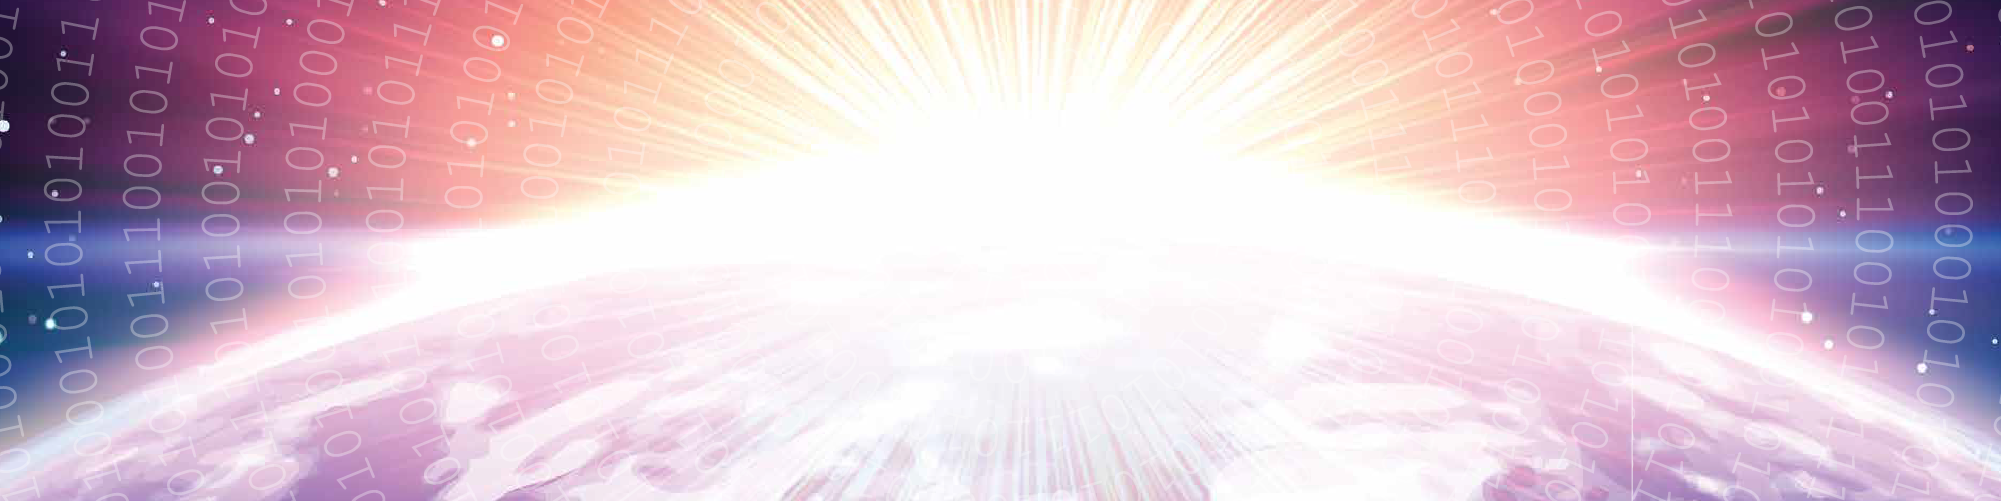 Planet in space in sunlight